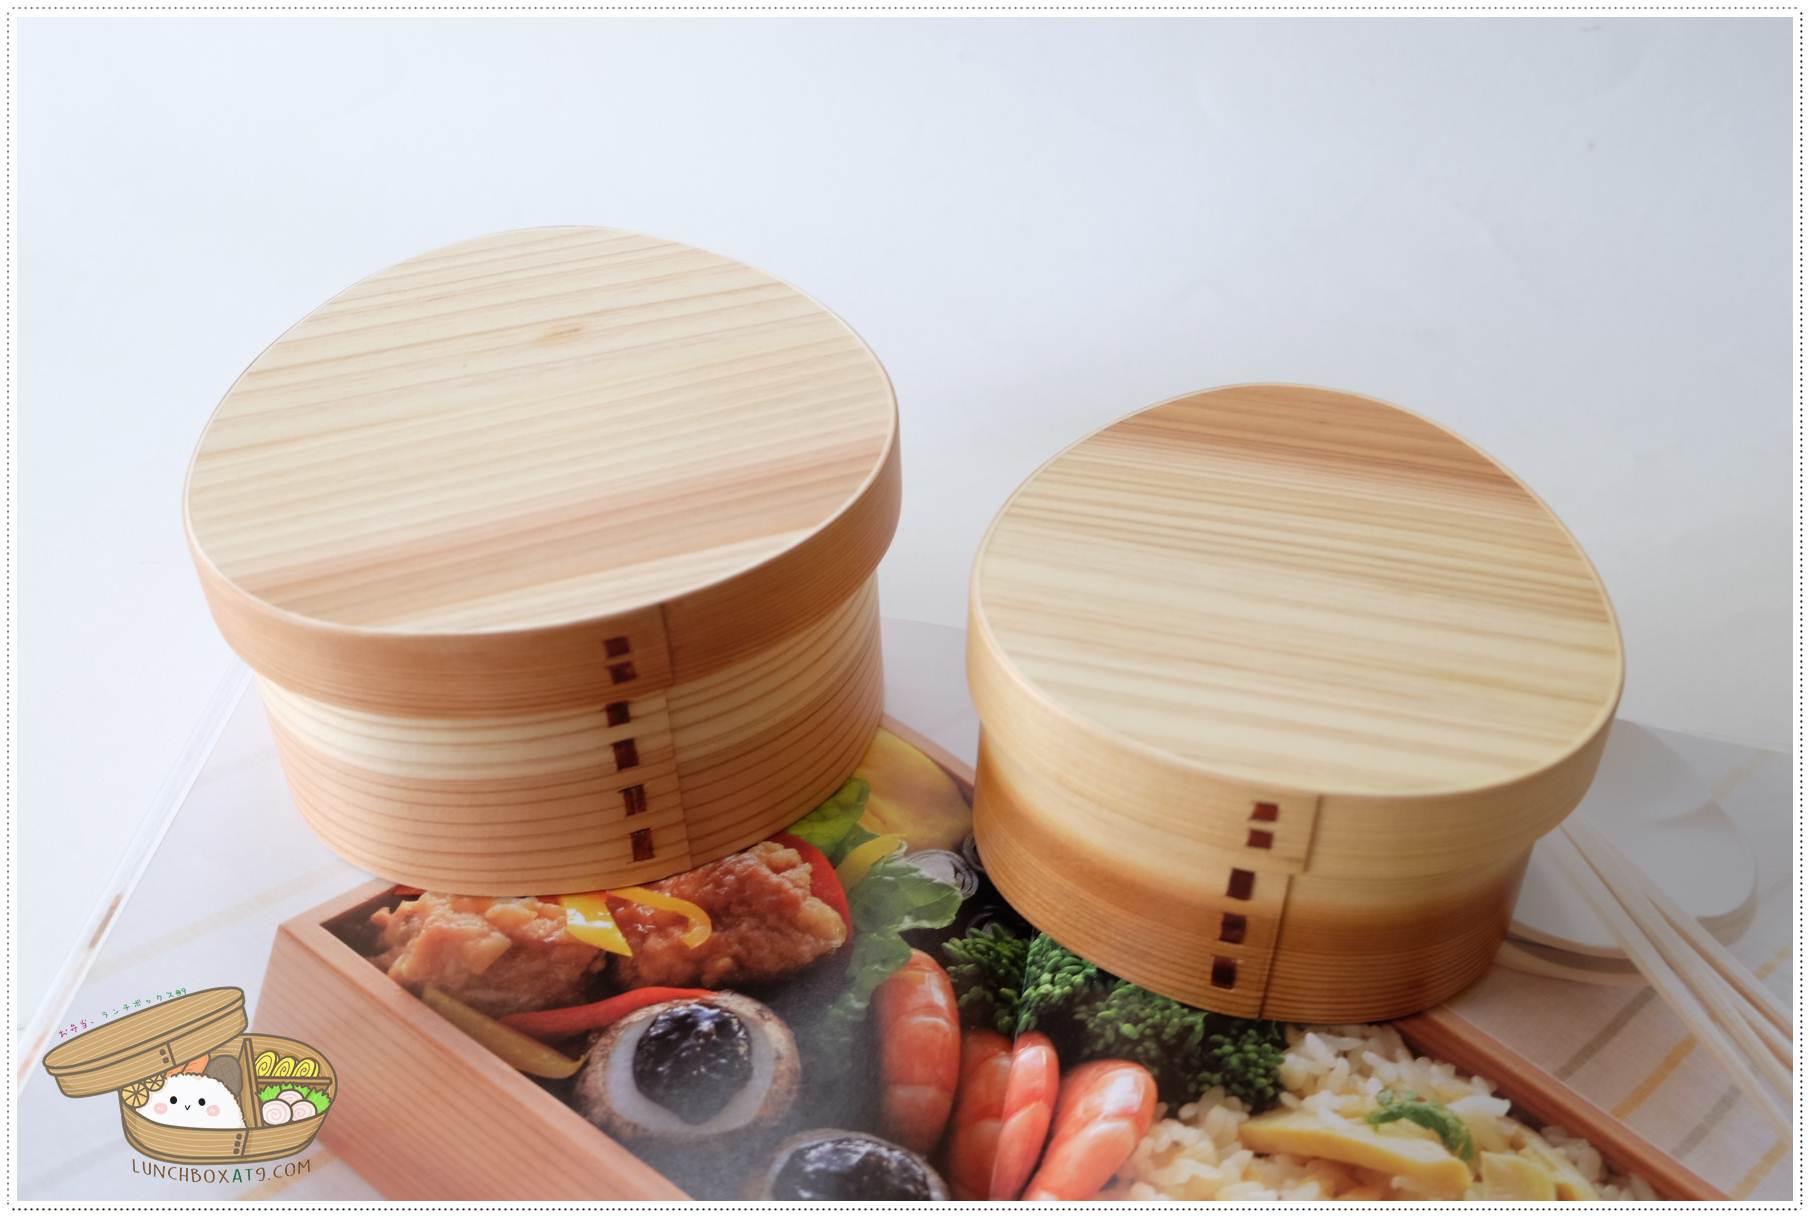 Bending Triangle Cedar Wood Bento - Limited Edition กล่องข้าวญี่ปุ่นสามเหลี่ยม 1 ชั้น